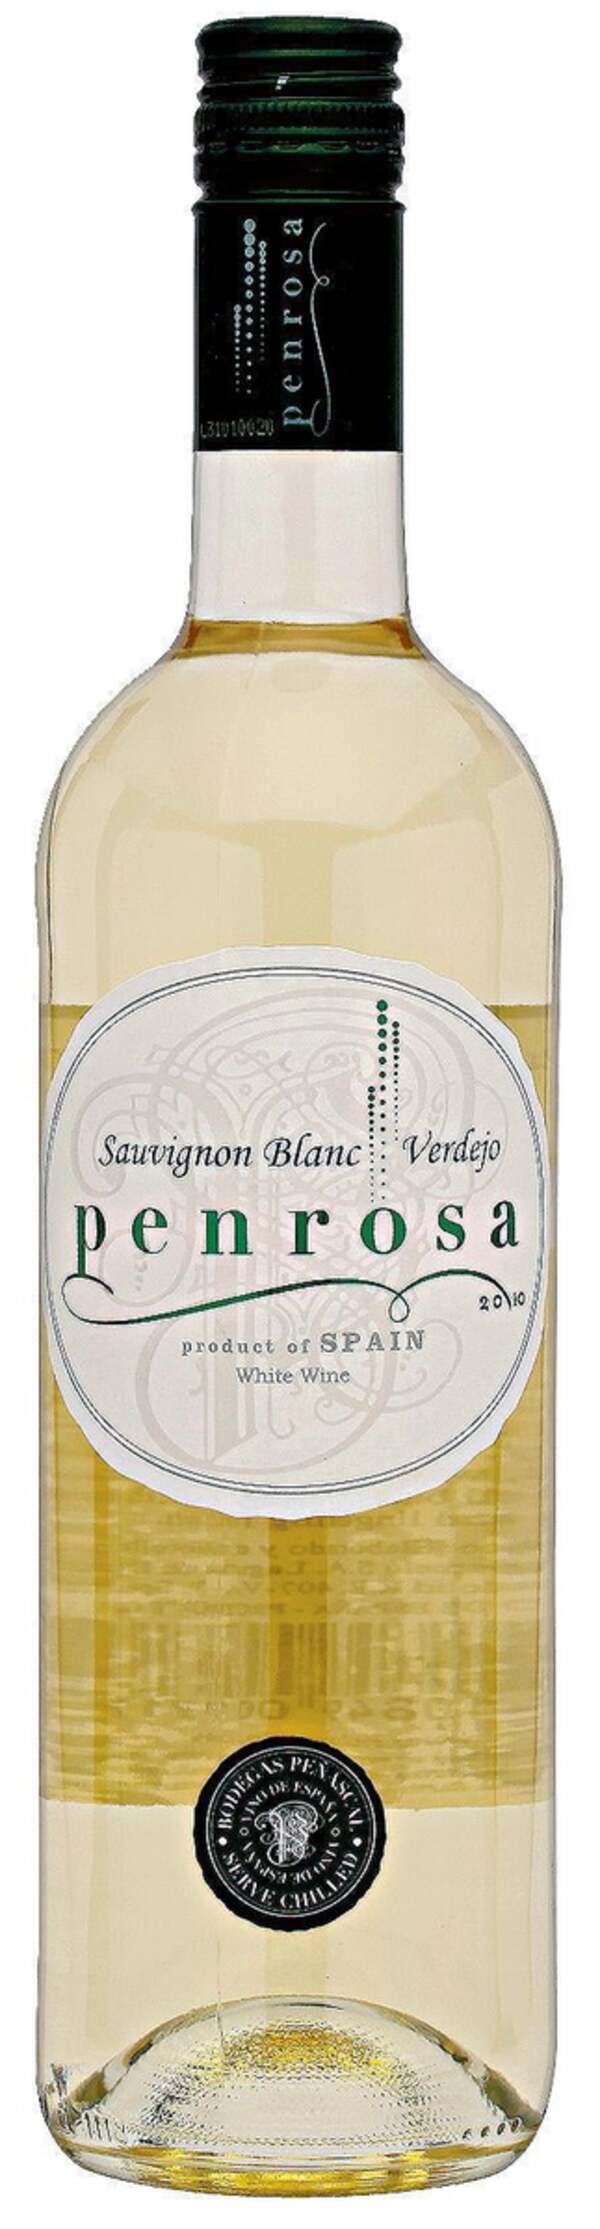 Penrosa Blanco Sauvignon Blanc- Verdejo